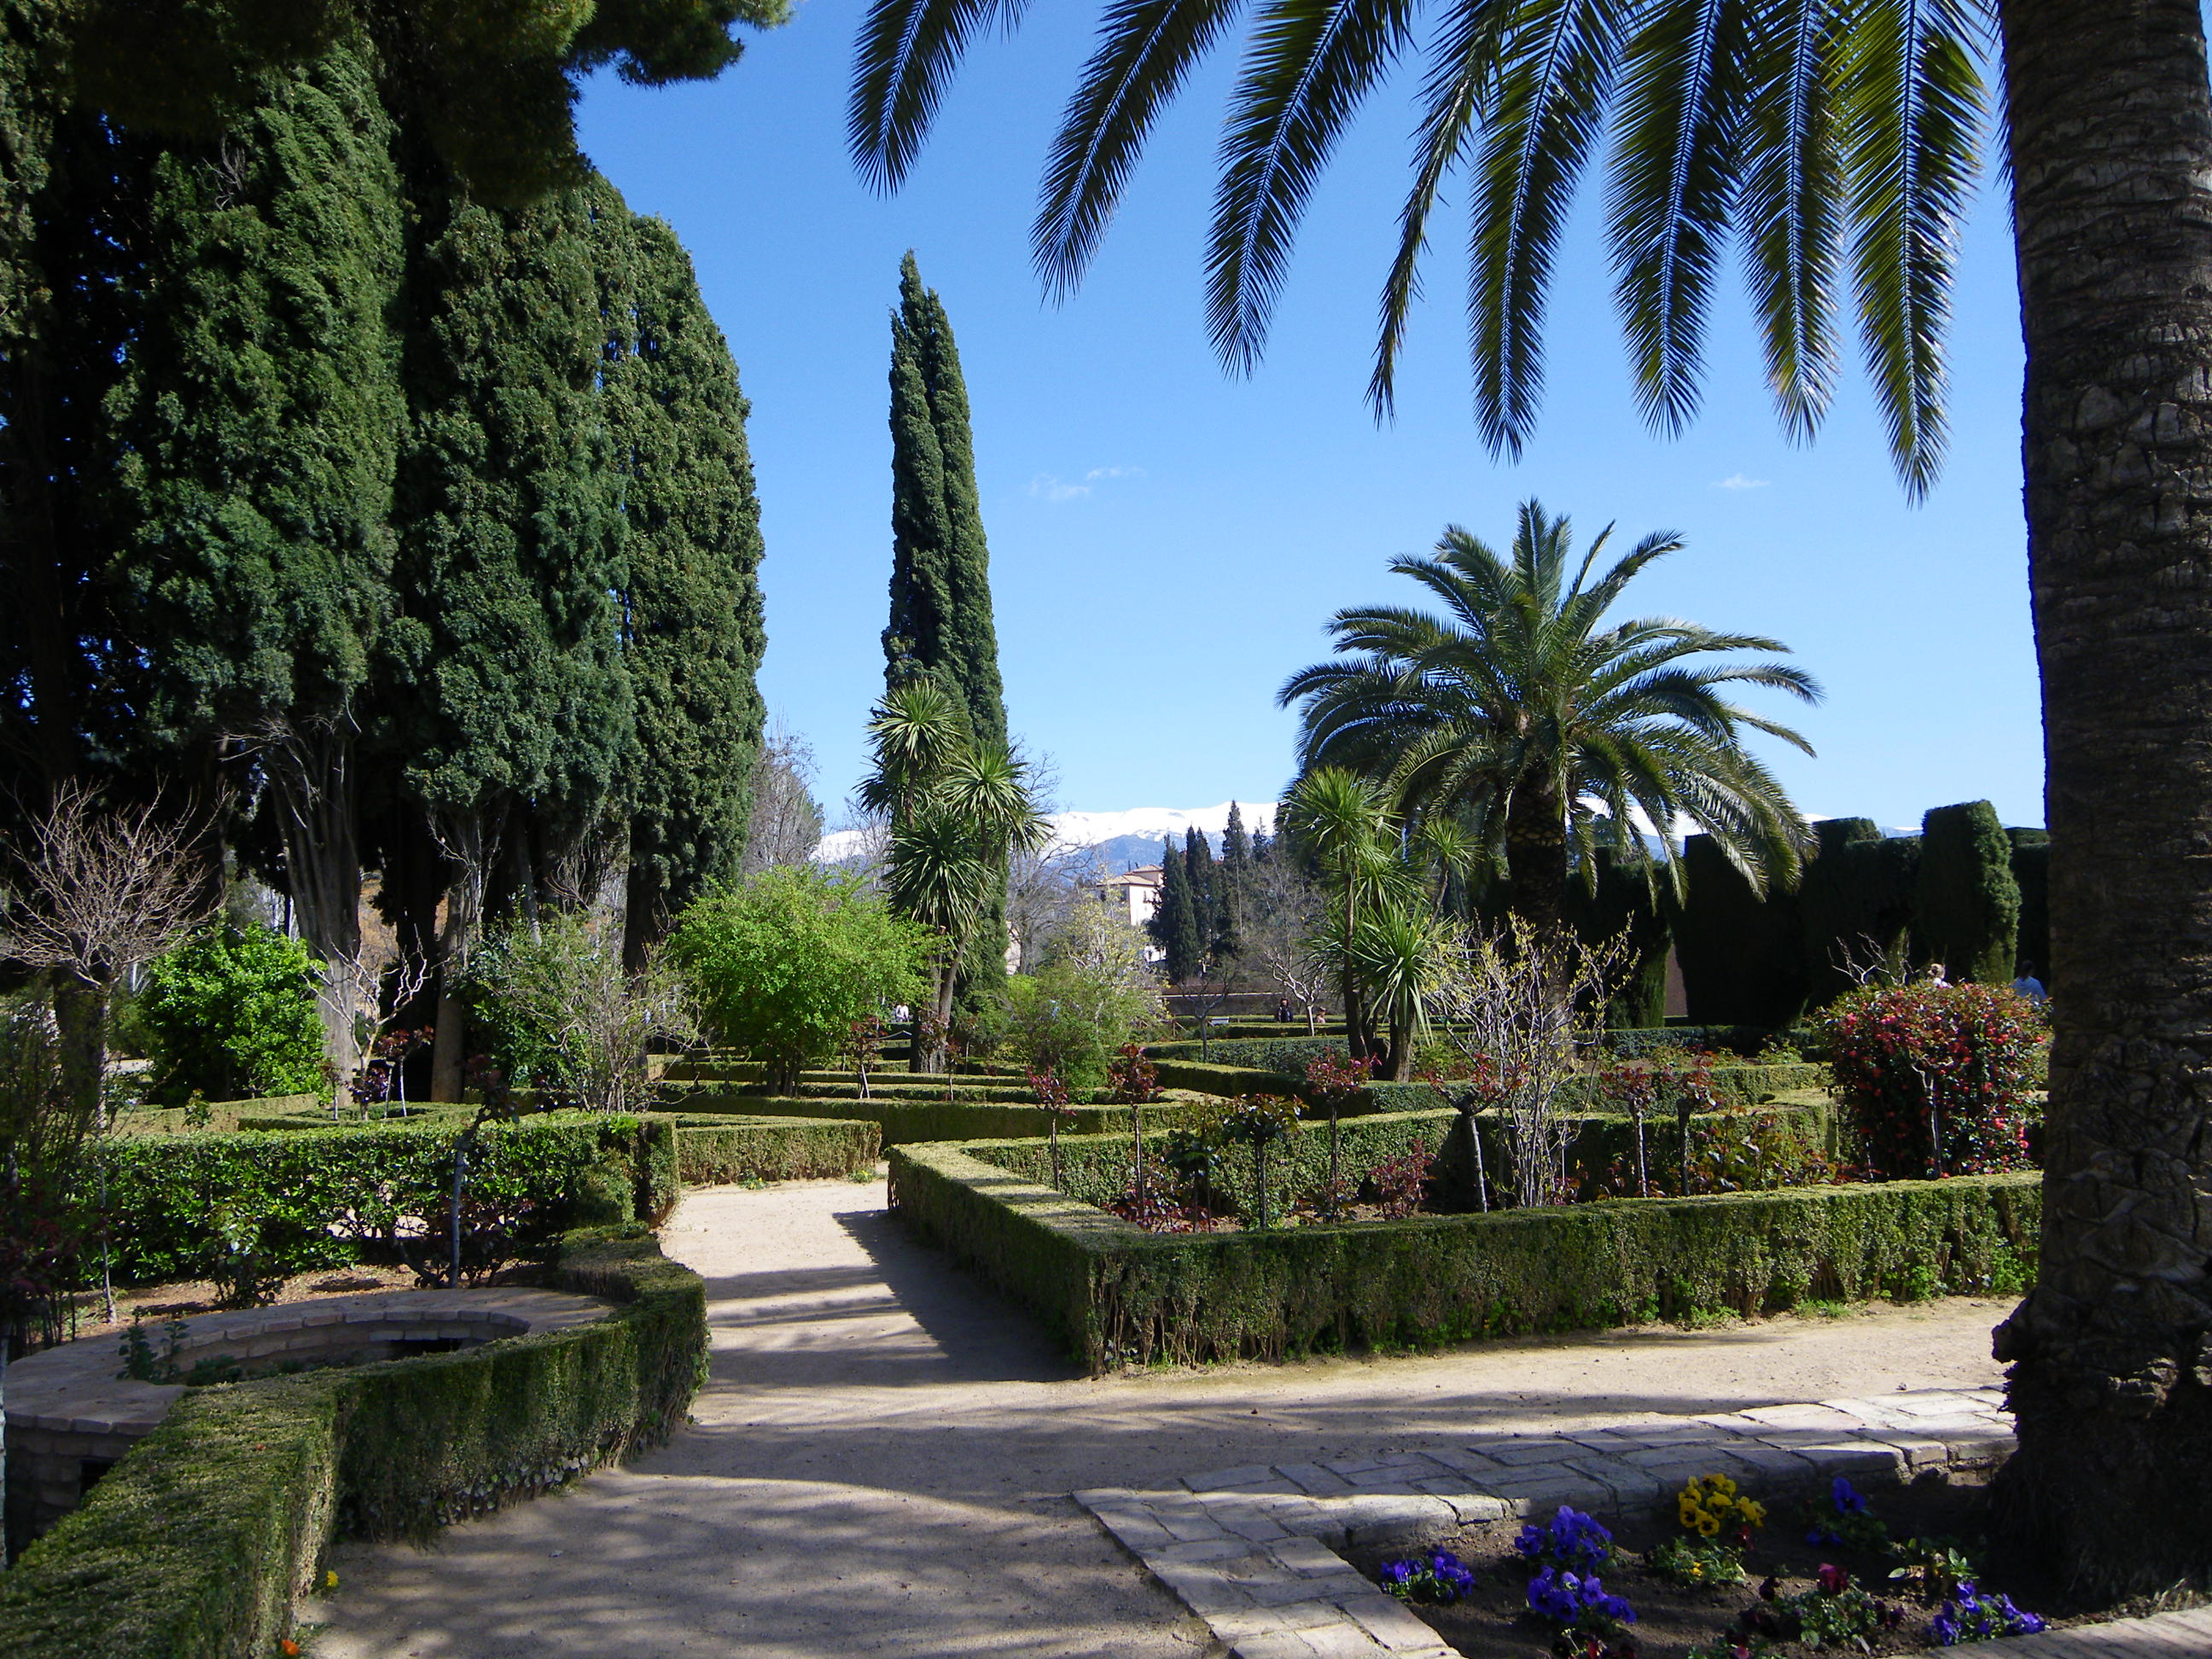 Jardines de la alhambra granada espa a seremache 39 s blog for Jardines alhambra